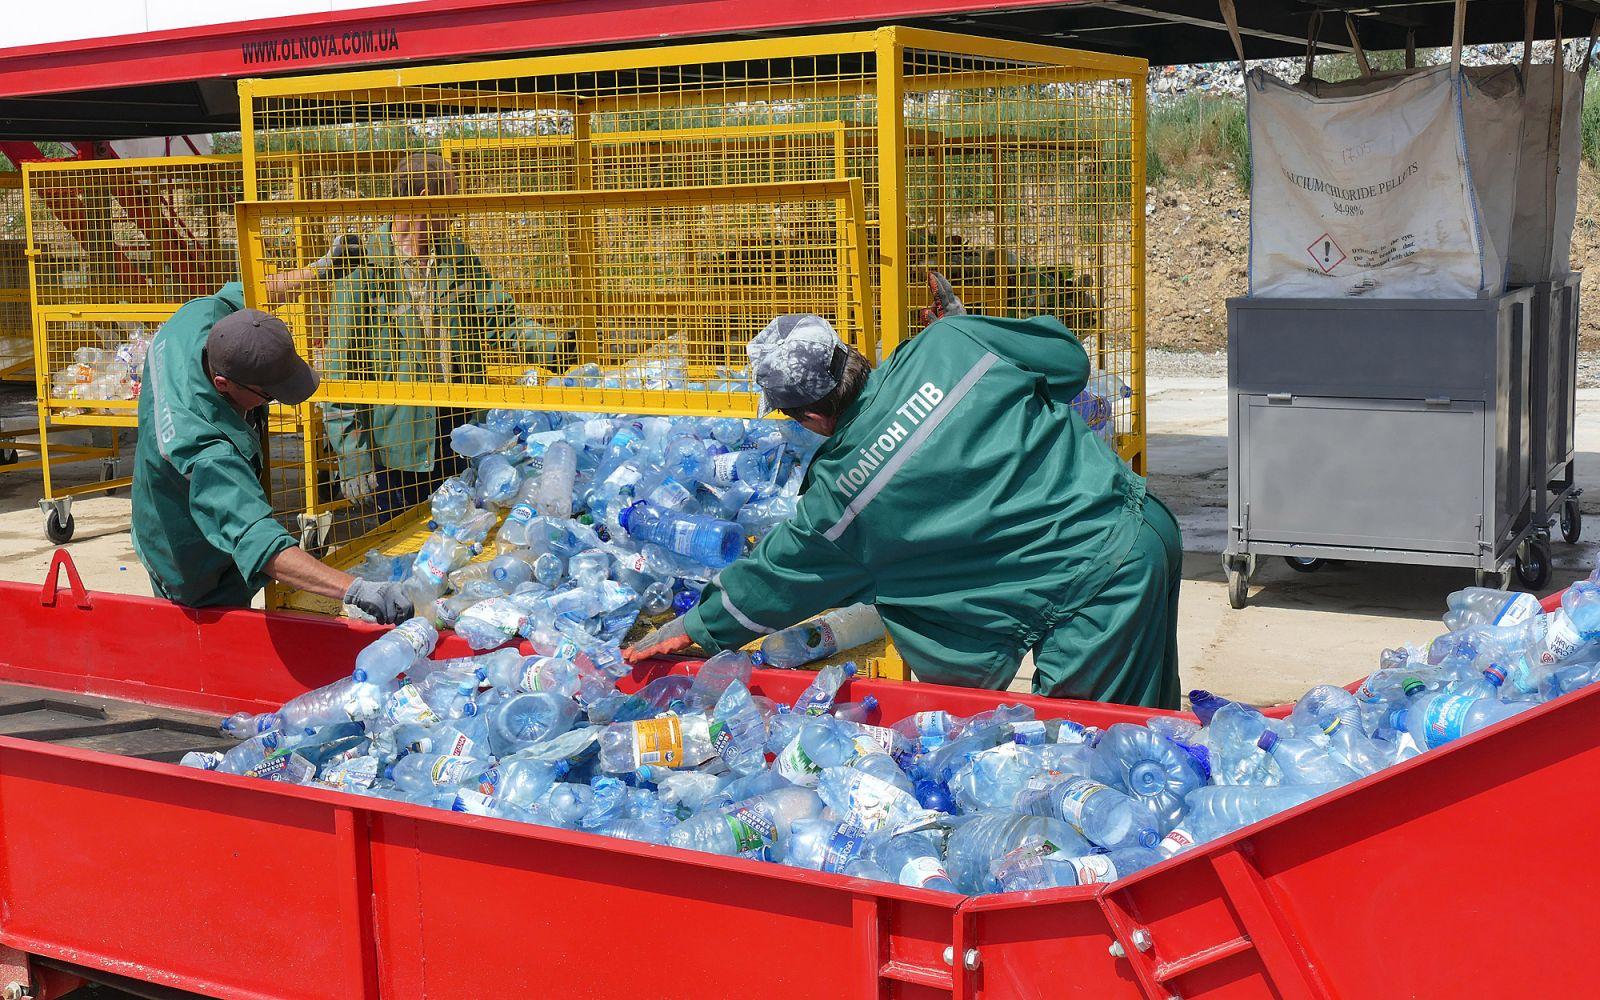 Пакетик с пакетиками. Как Украине справиться с эпидемией пластика